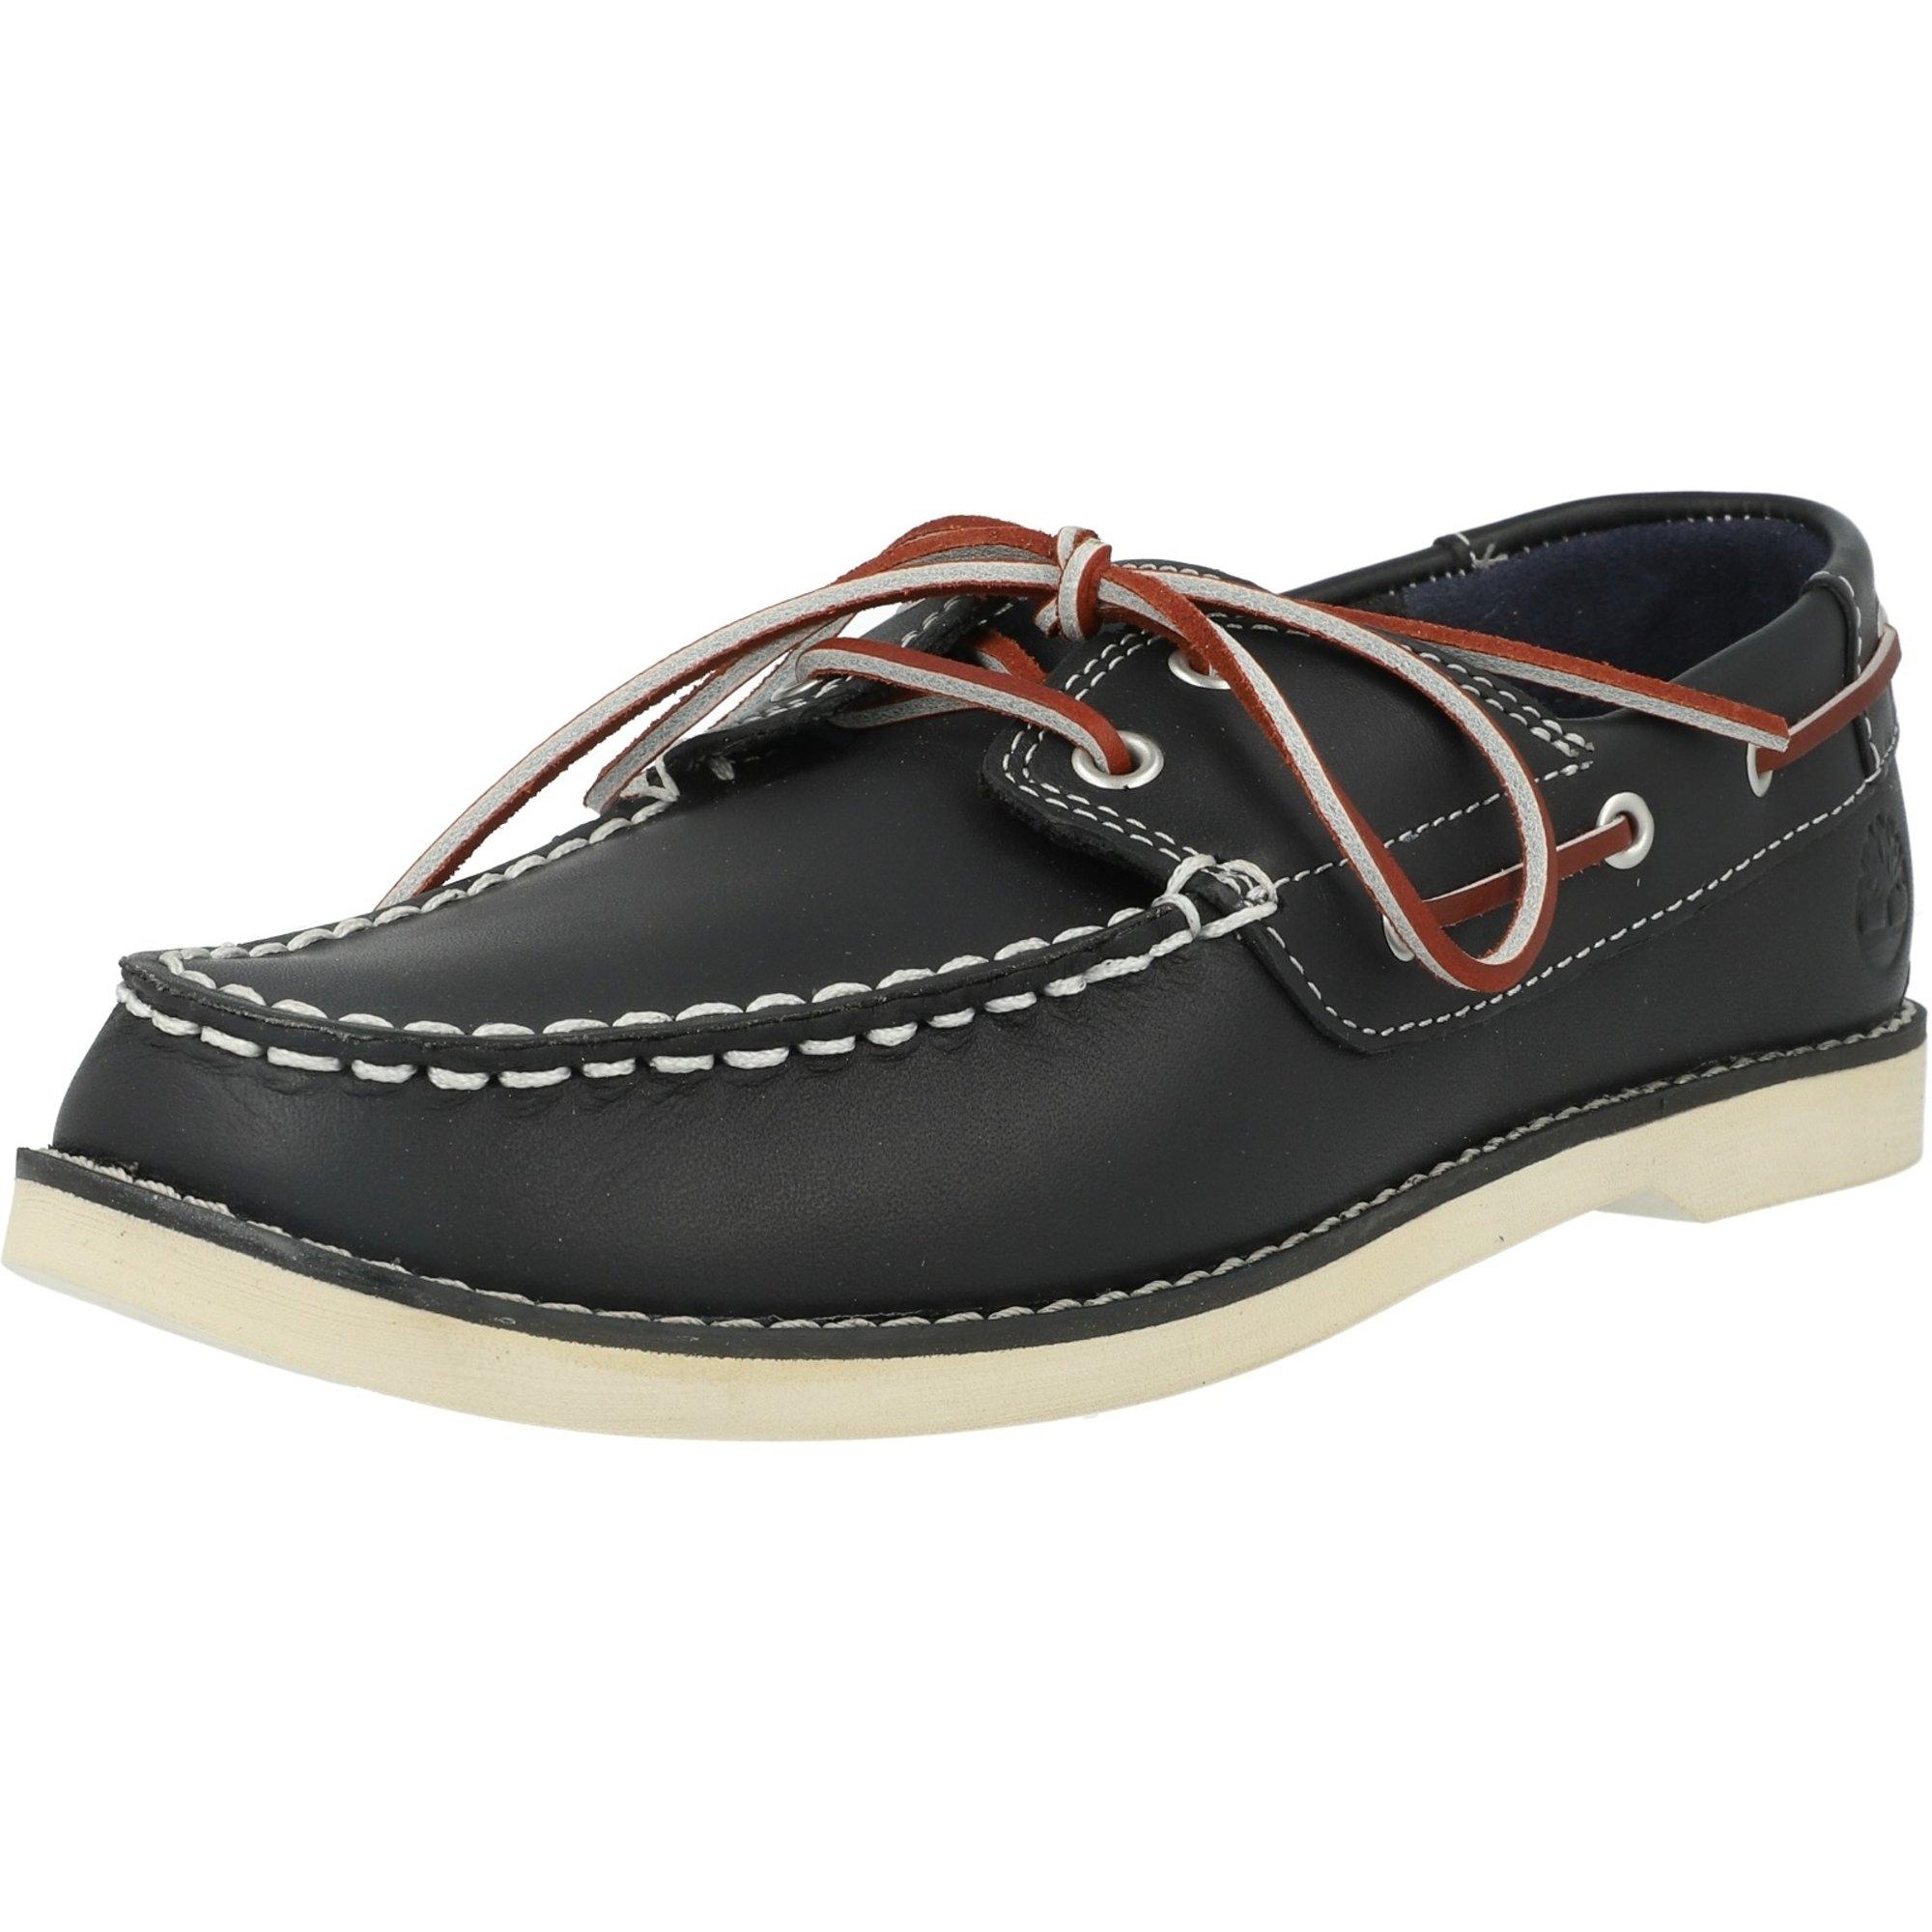 Timberland Seabury Classic J Navy Leather